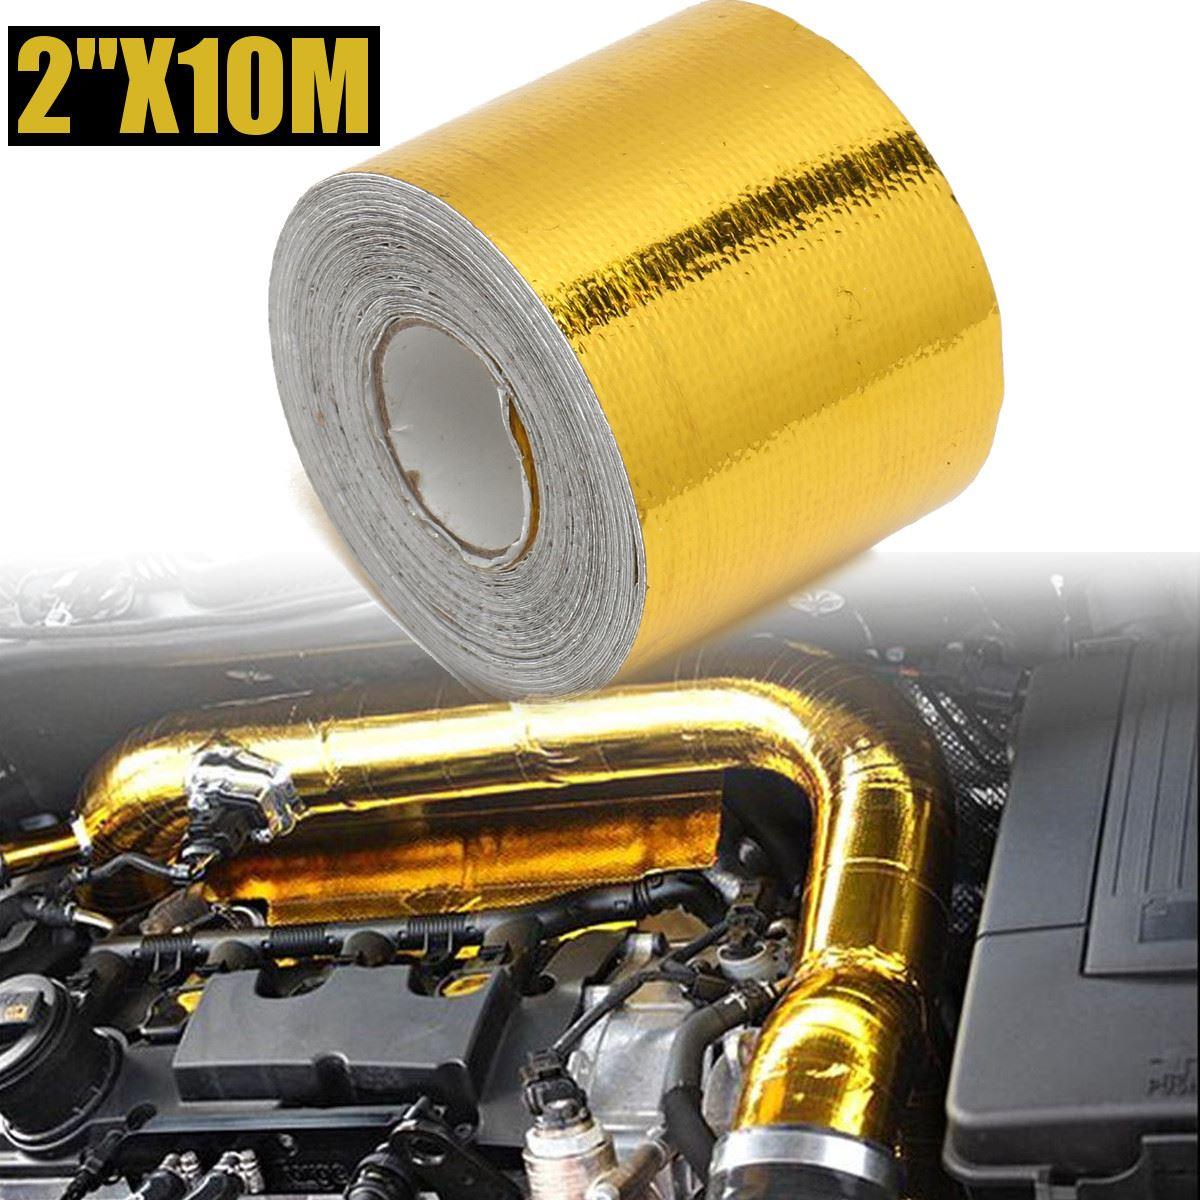 4.5m/5m/10m Car Fiberglass Self Adhesive Gold High Temperature Heat Shield Wrap Tape